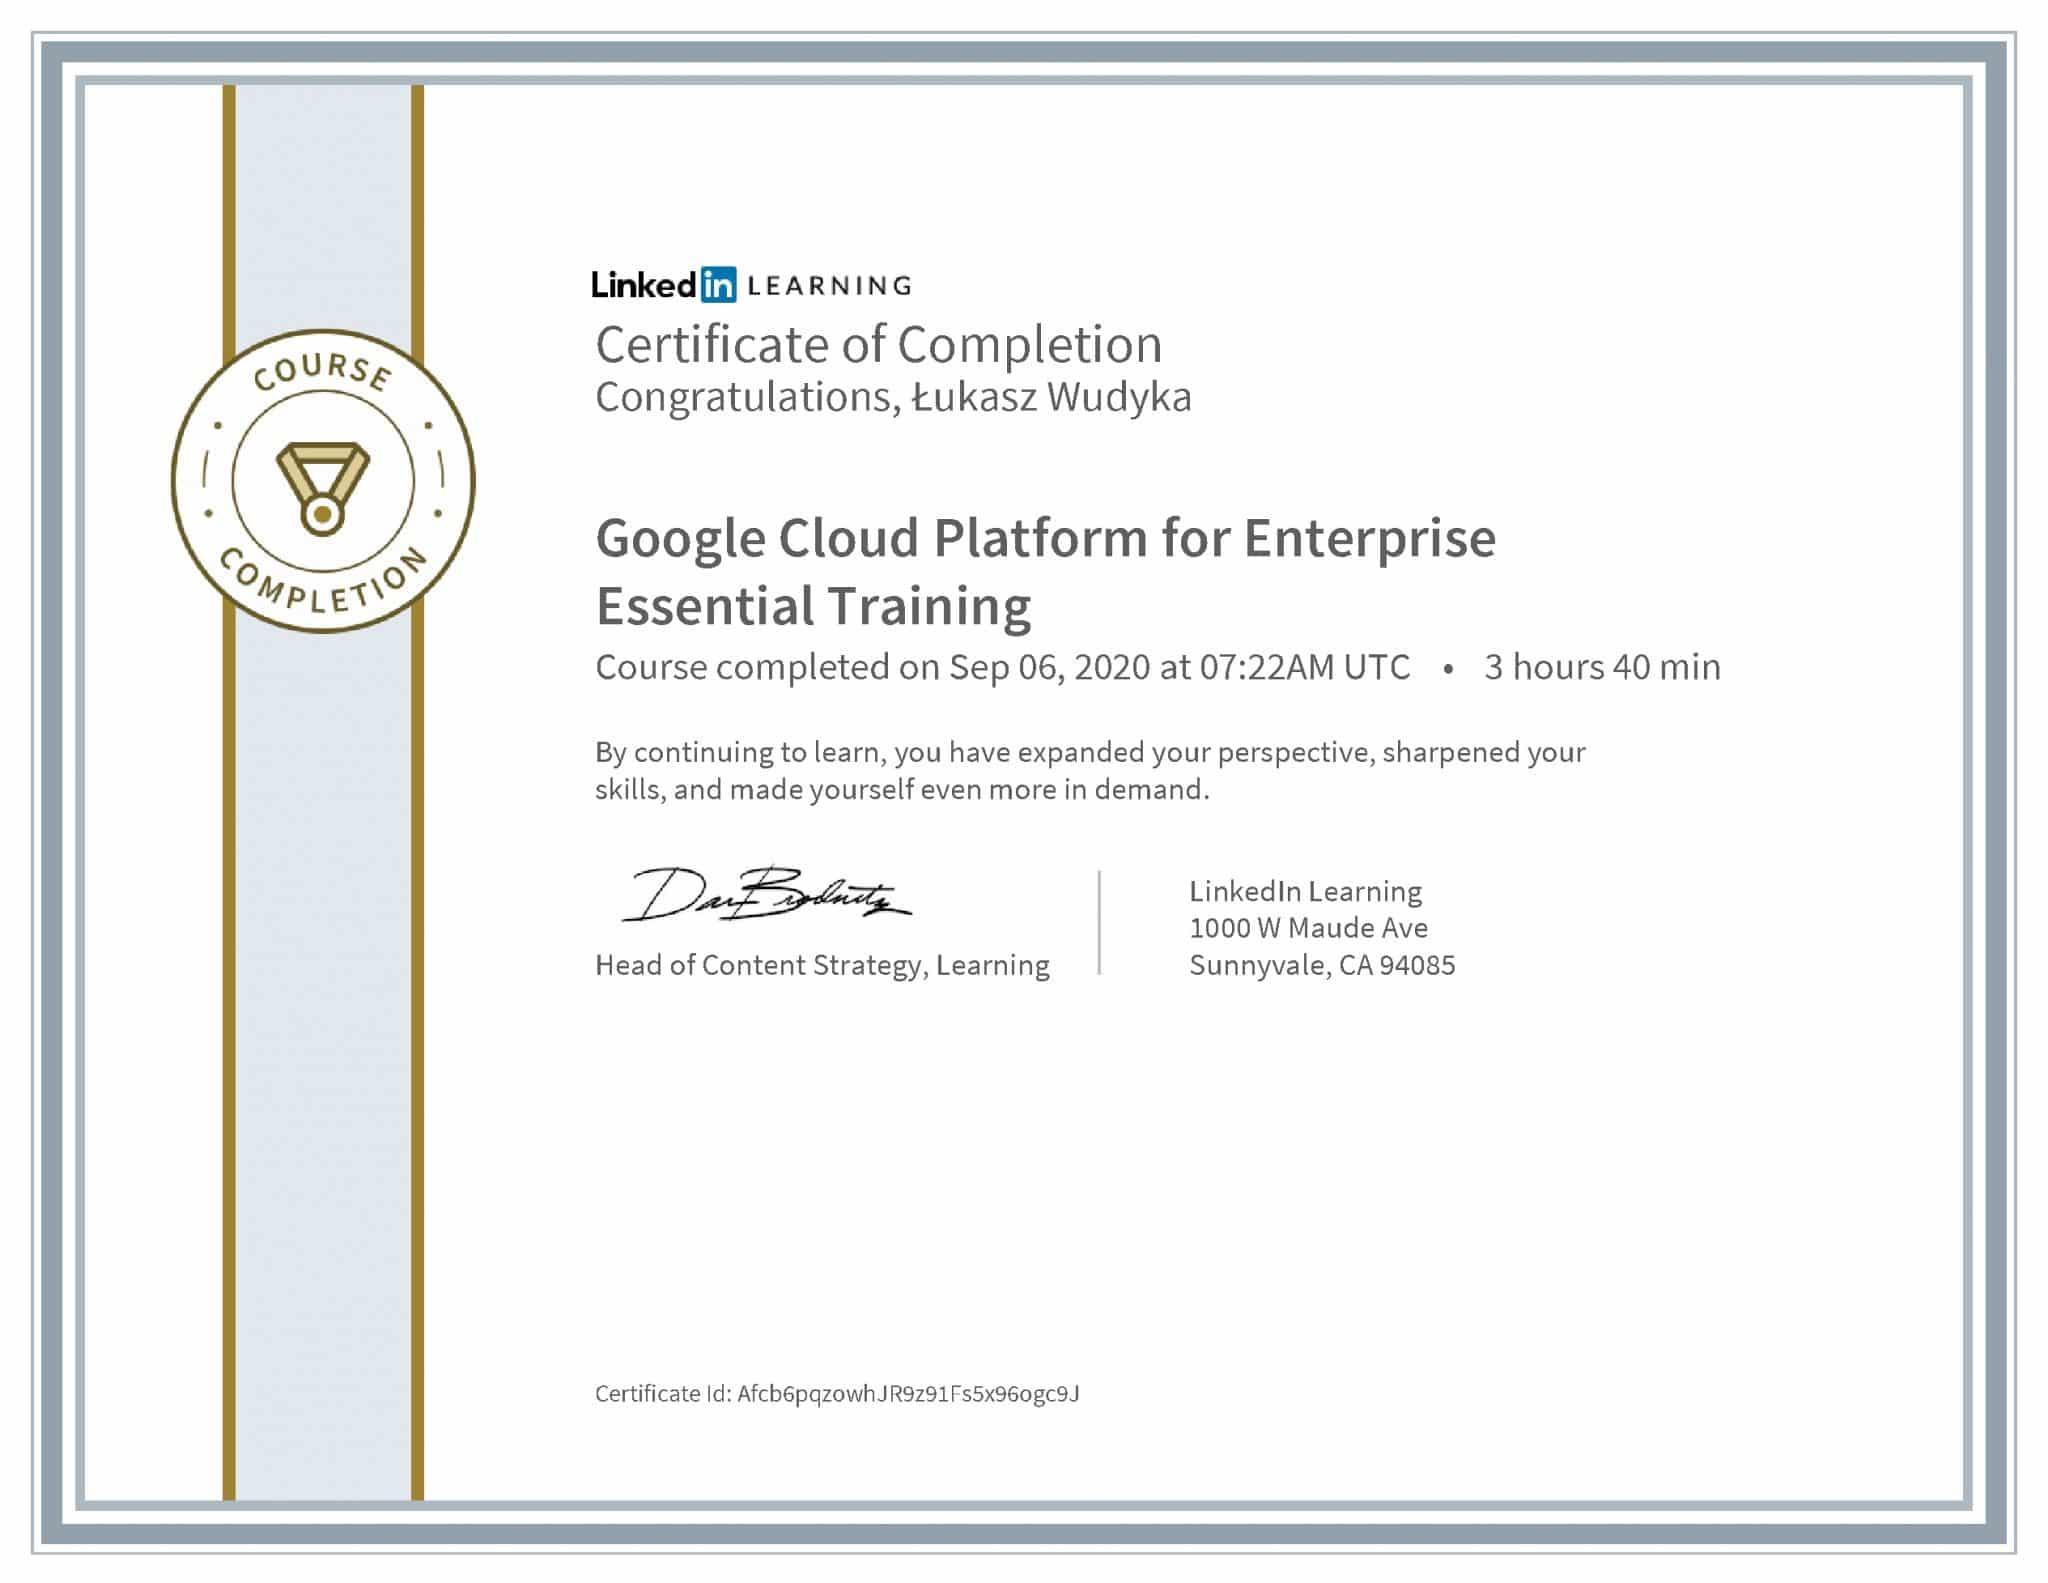 Łukasz Wudyka certyfikat LinkedIn Google Cloud Platform for Enterprise Essential Training